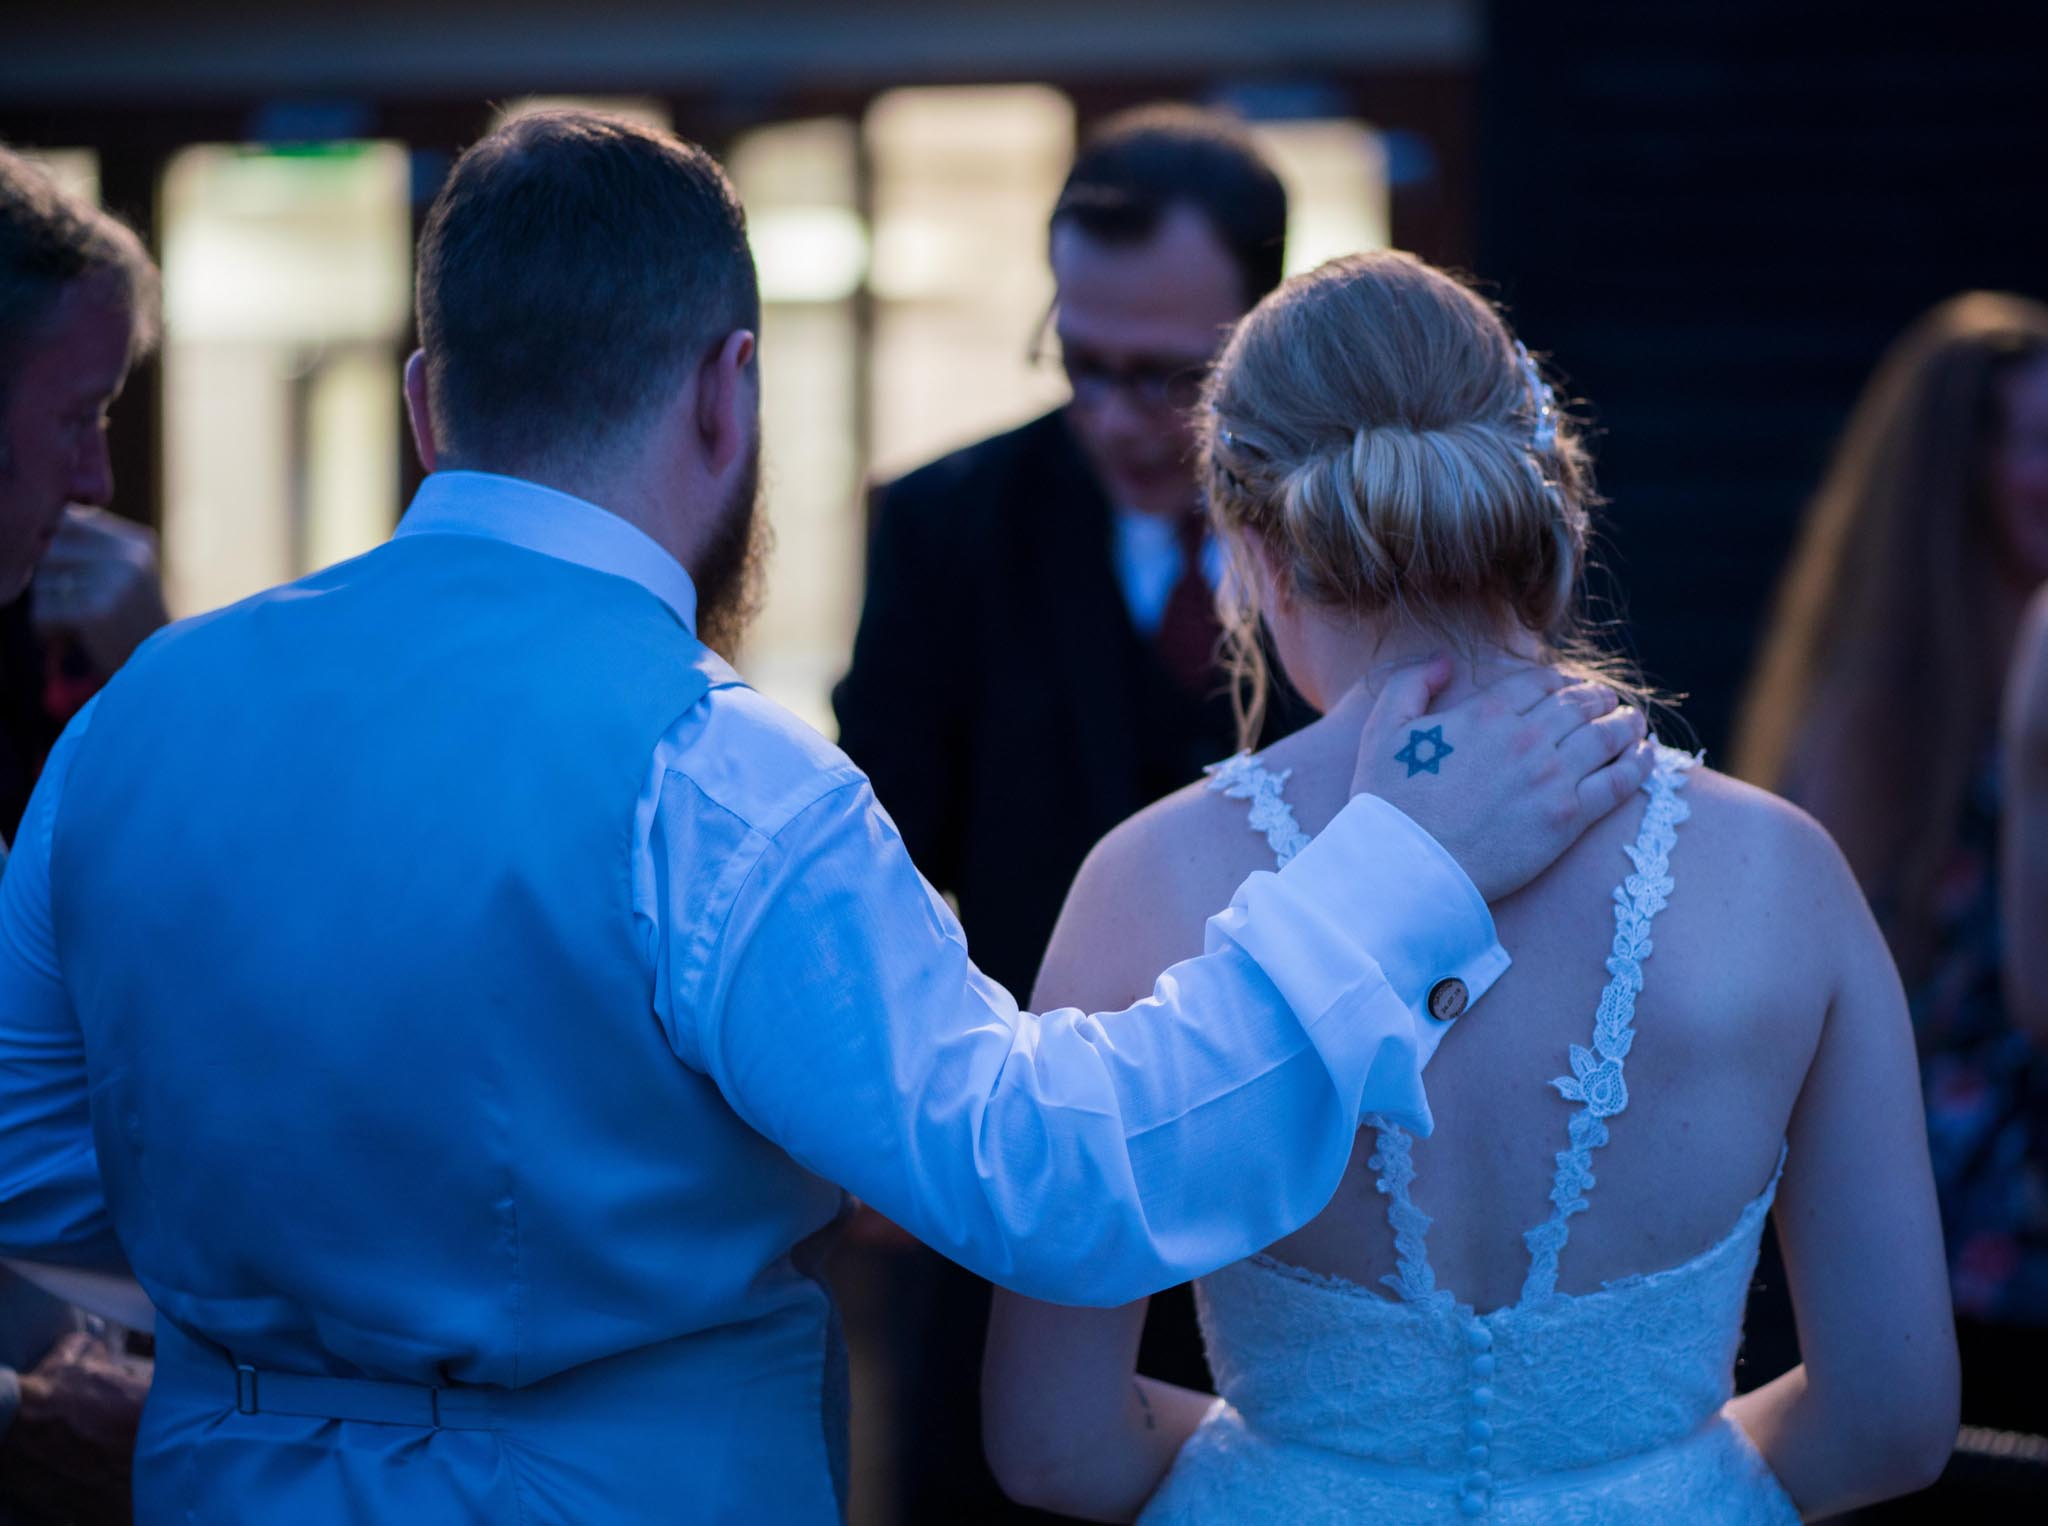 982-Night-Reception-Luke-Yasmin-The-Rayleigh-Club-Wedding-Photography.jpg